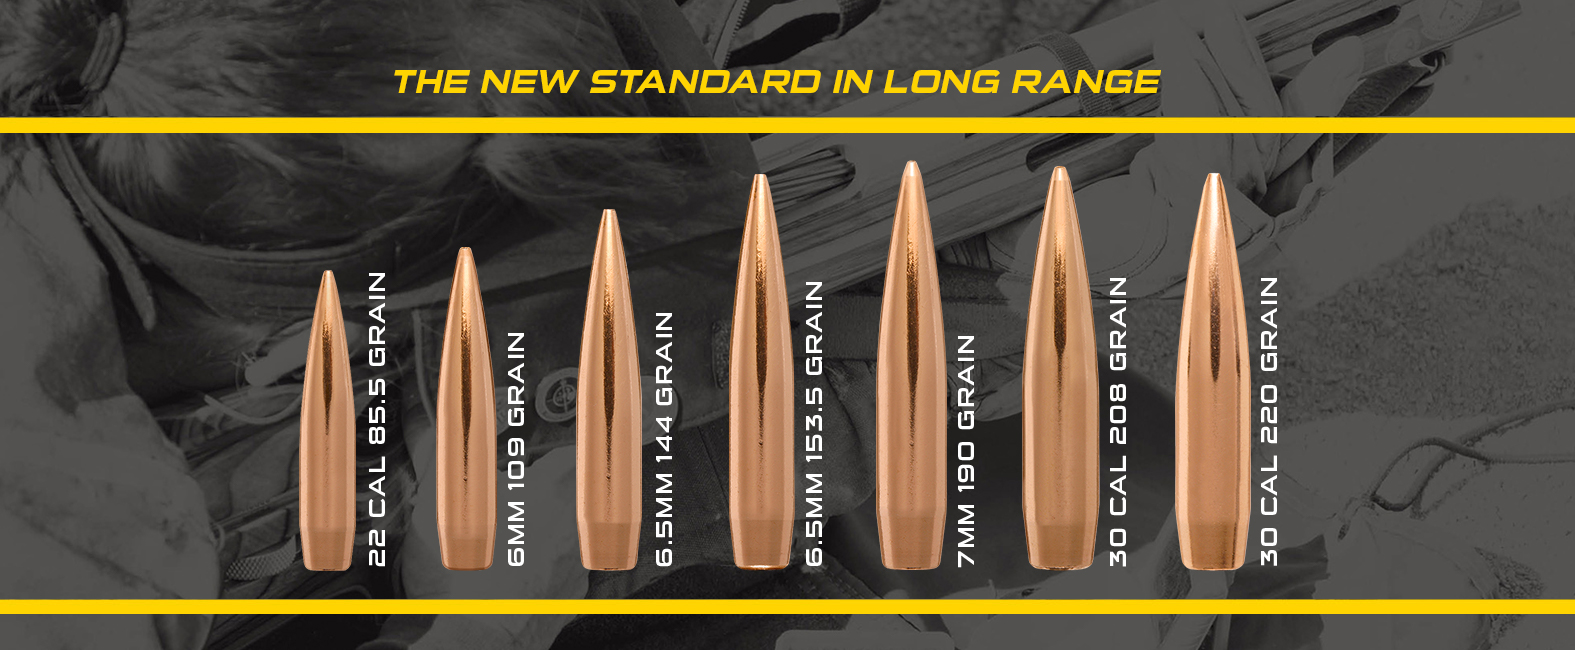 image of Berger Long Range Hybrid Target bullets